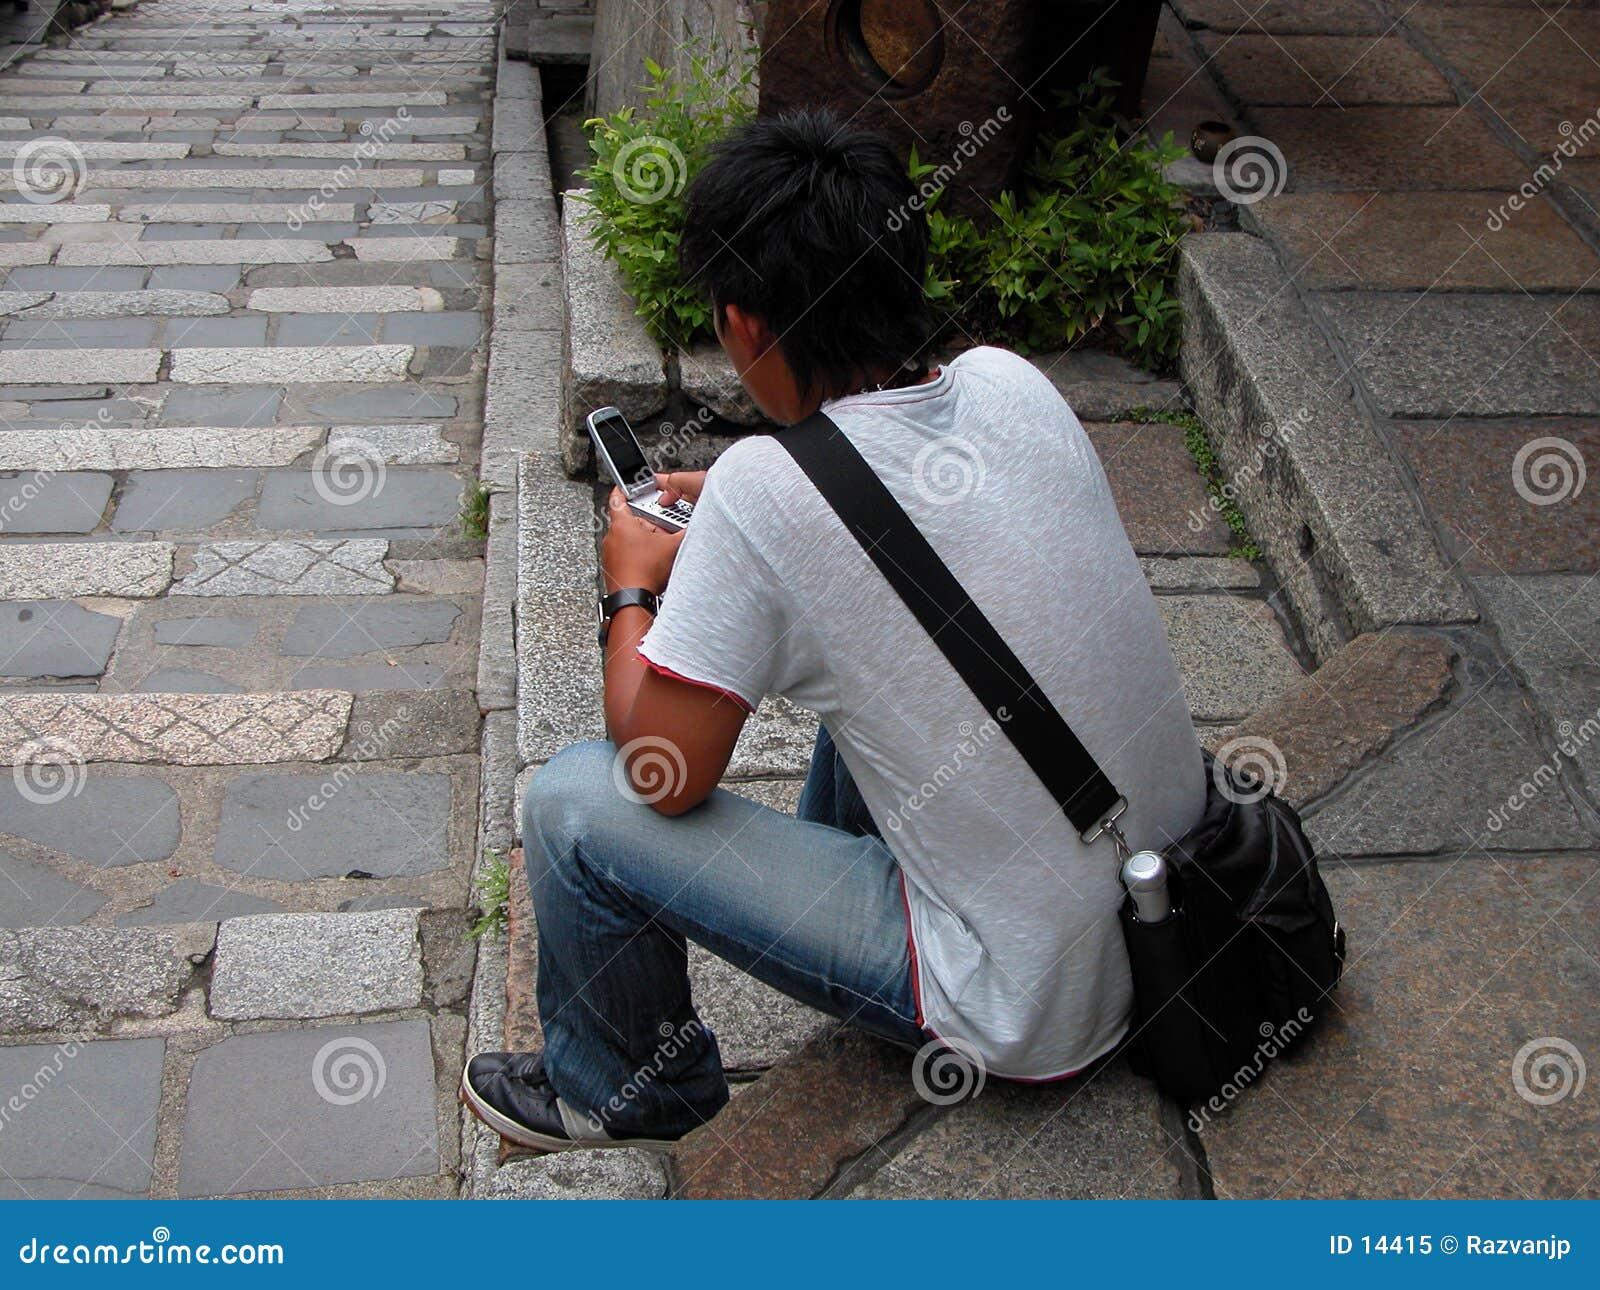 Handyphone używane